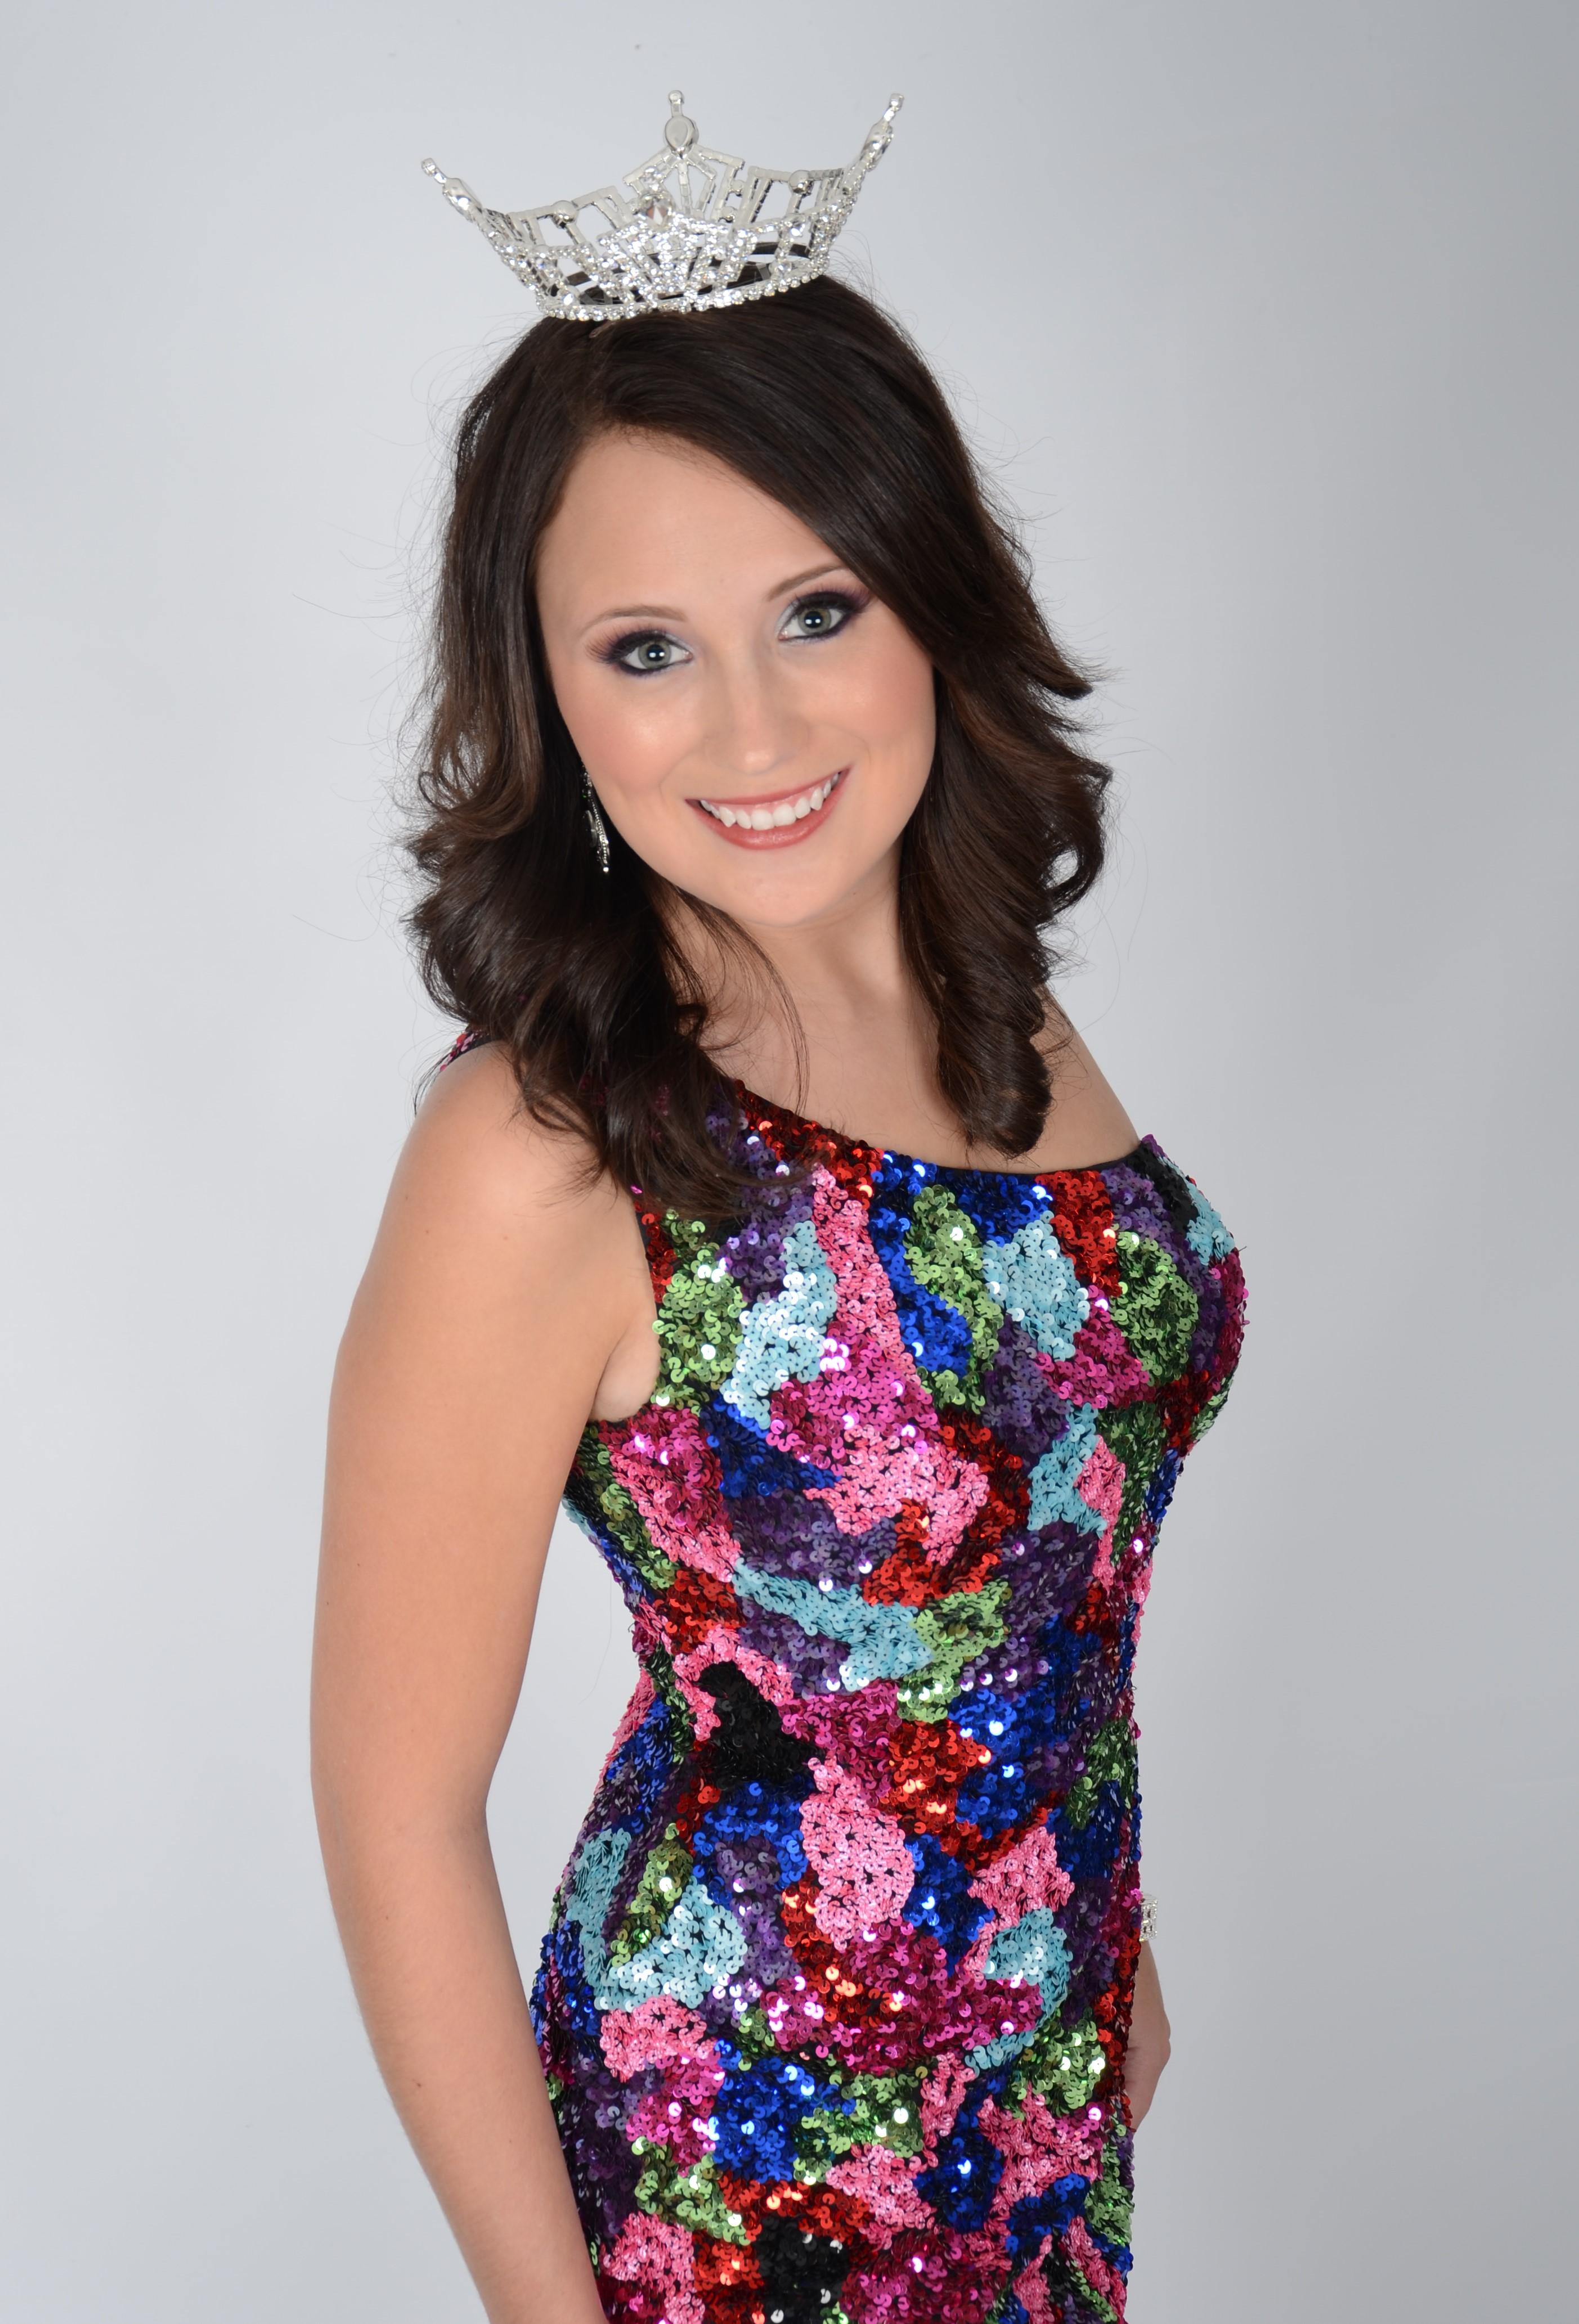 Megan Leibold